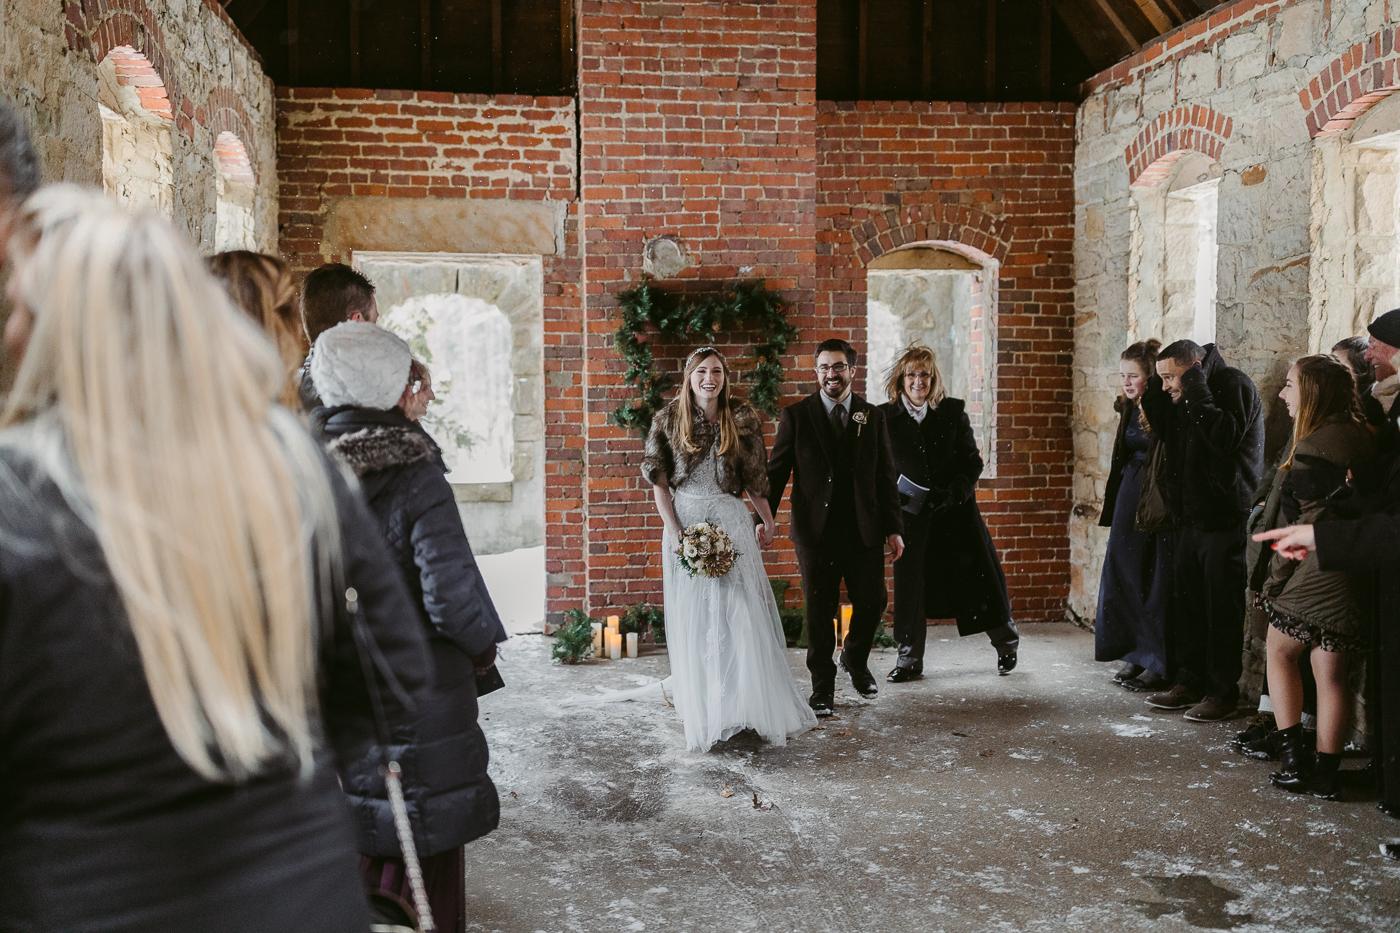 Squires-Castle-Winter-Wedding-36.jpg